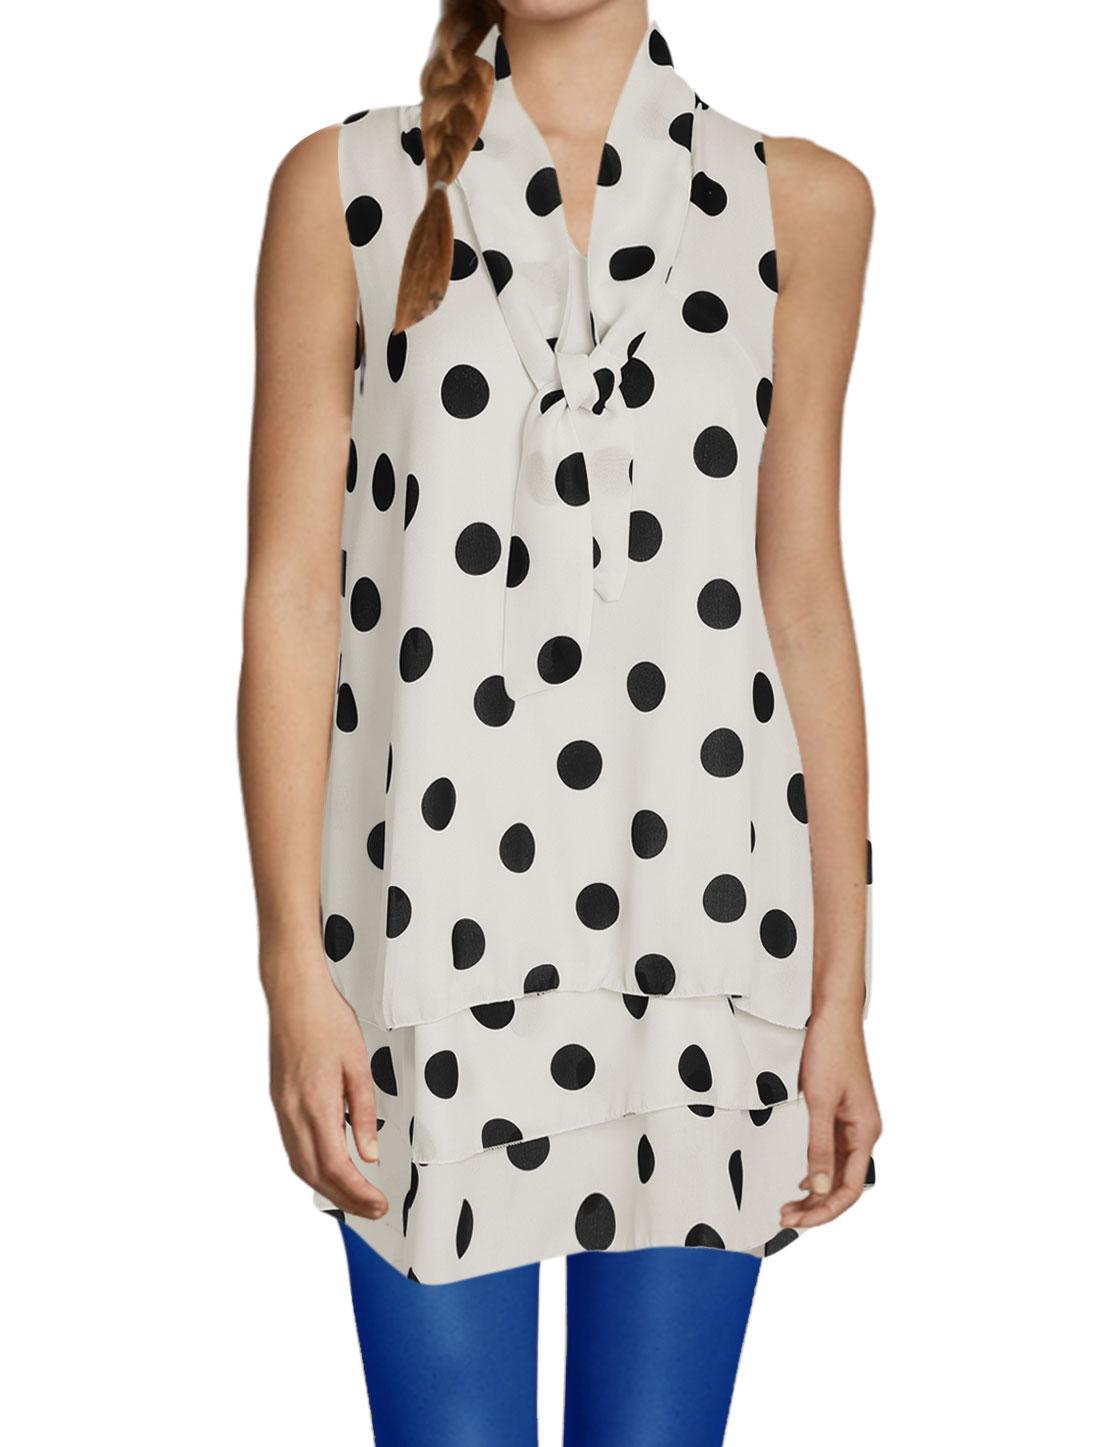 Woman Polka Dots Prints Pussybow Collar Sleeveless Layered Tunic Top White S